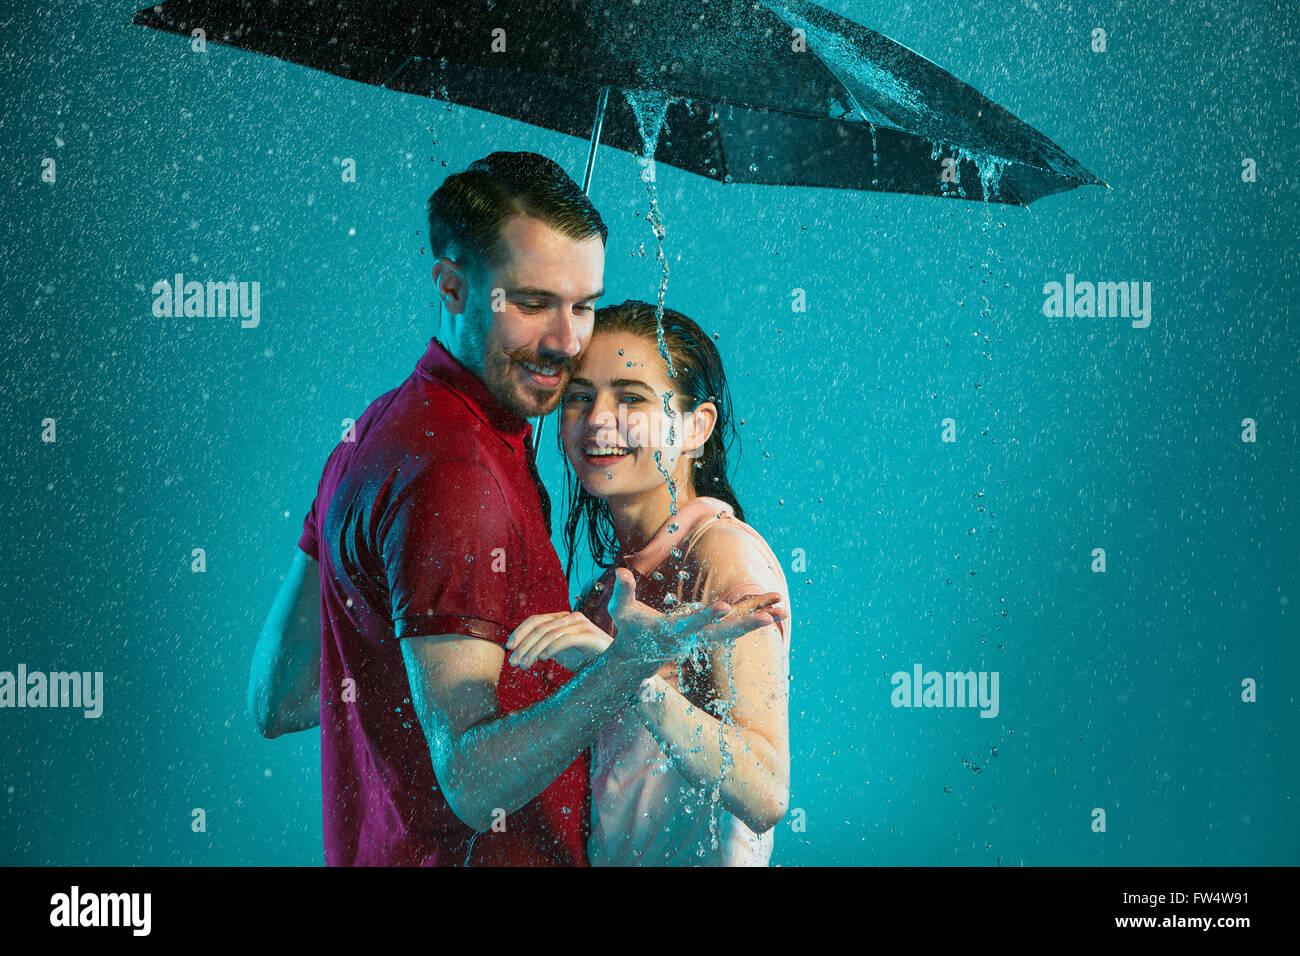 Romantic Couple Kissing In Rain Stockfotos & Romantic